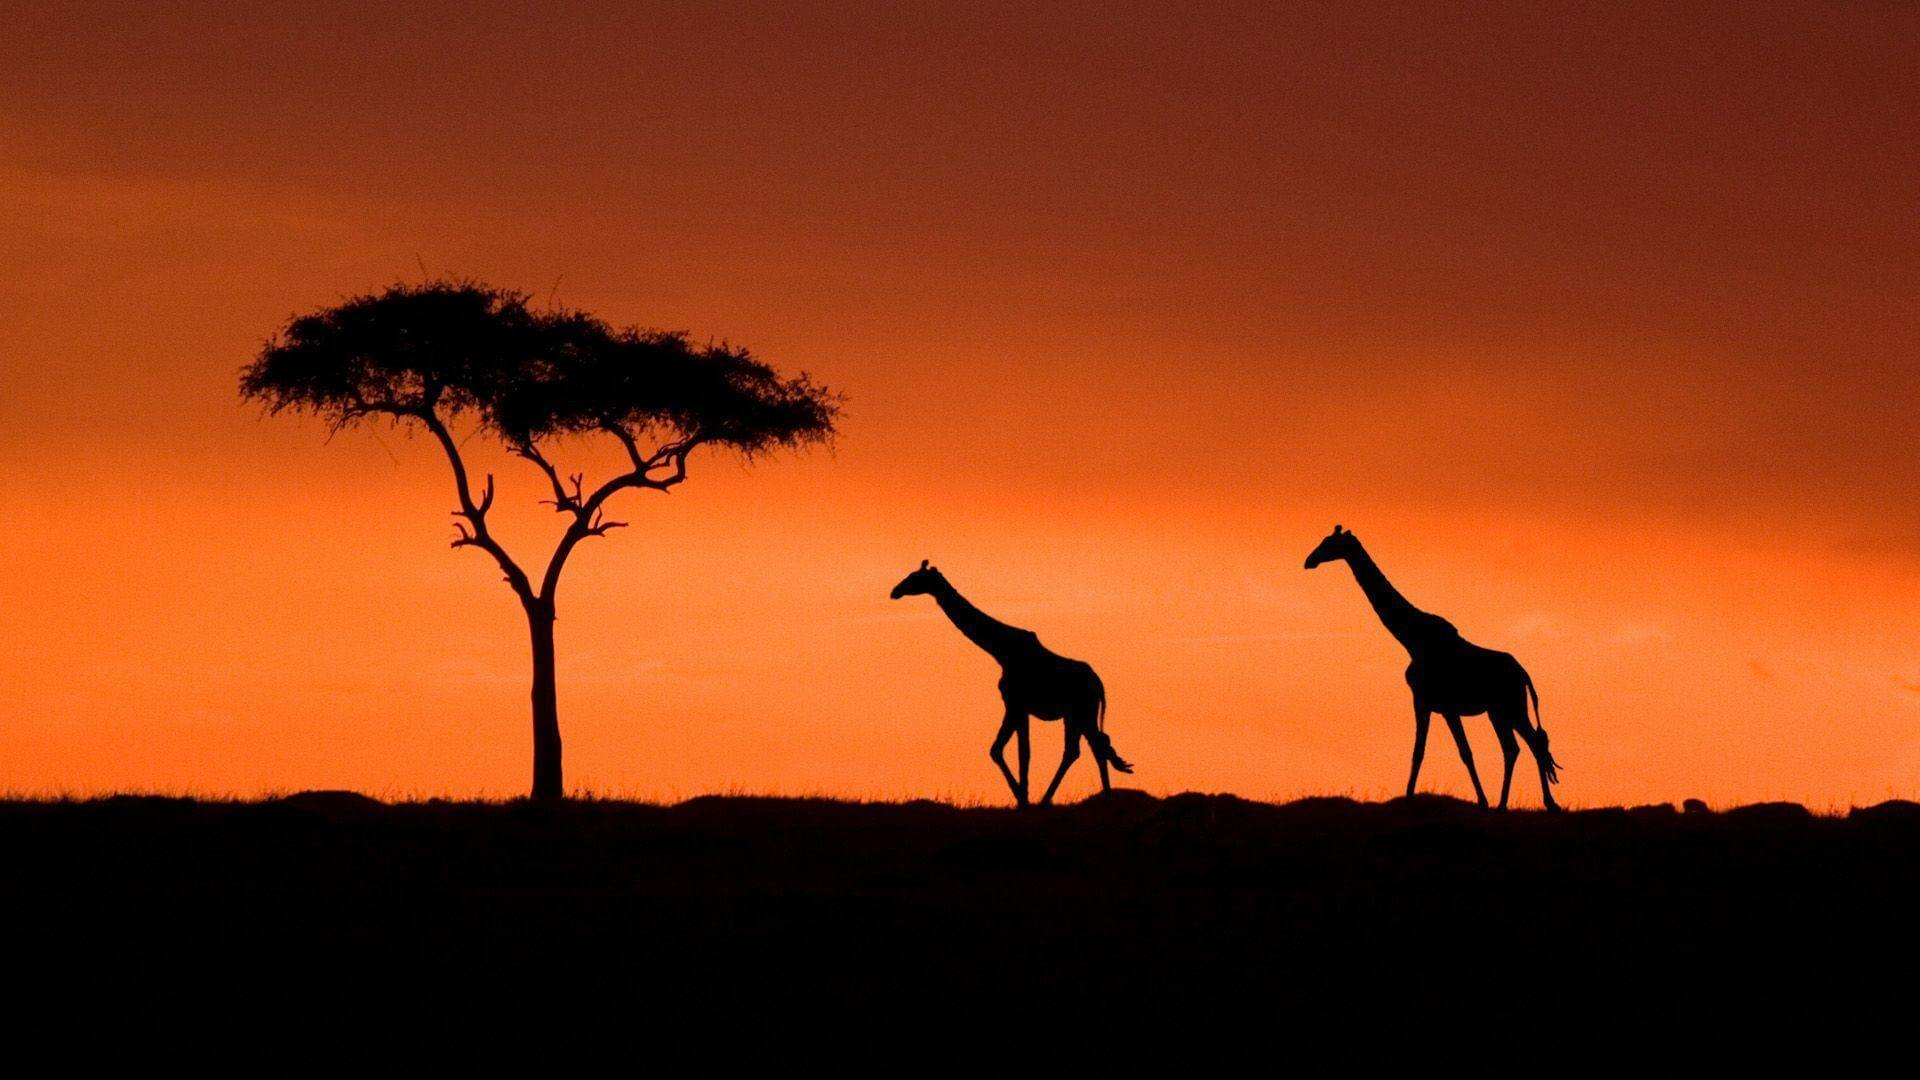 Honeymoon In KENYA Holiday Travel & Tour Package